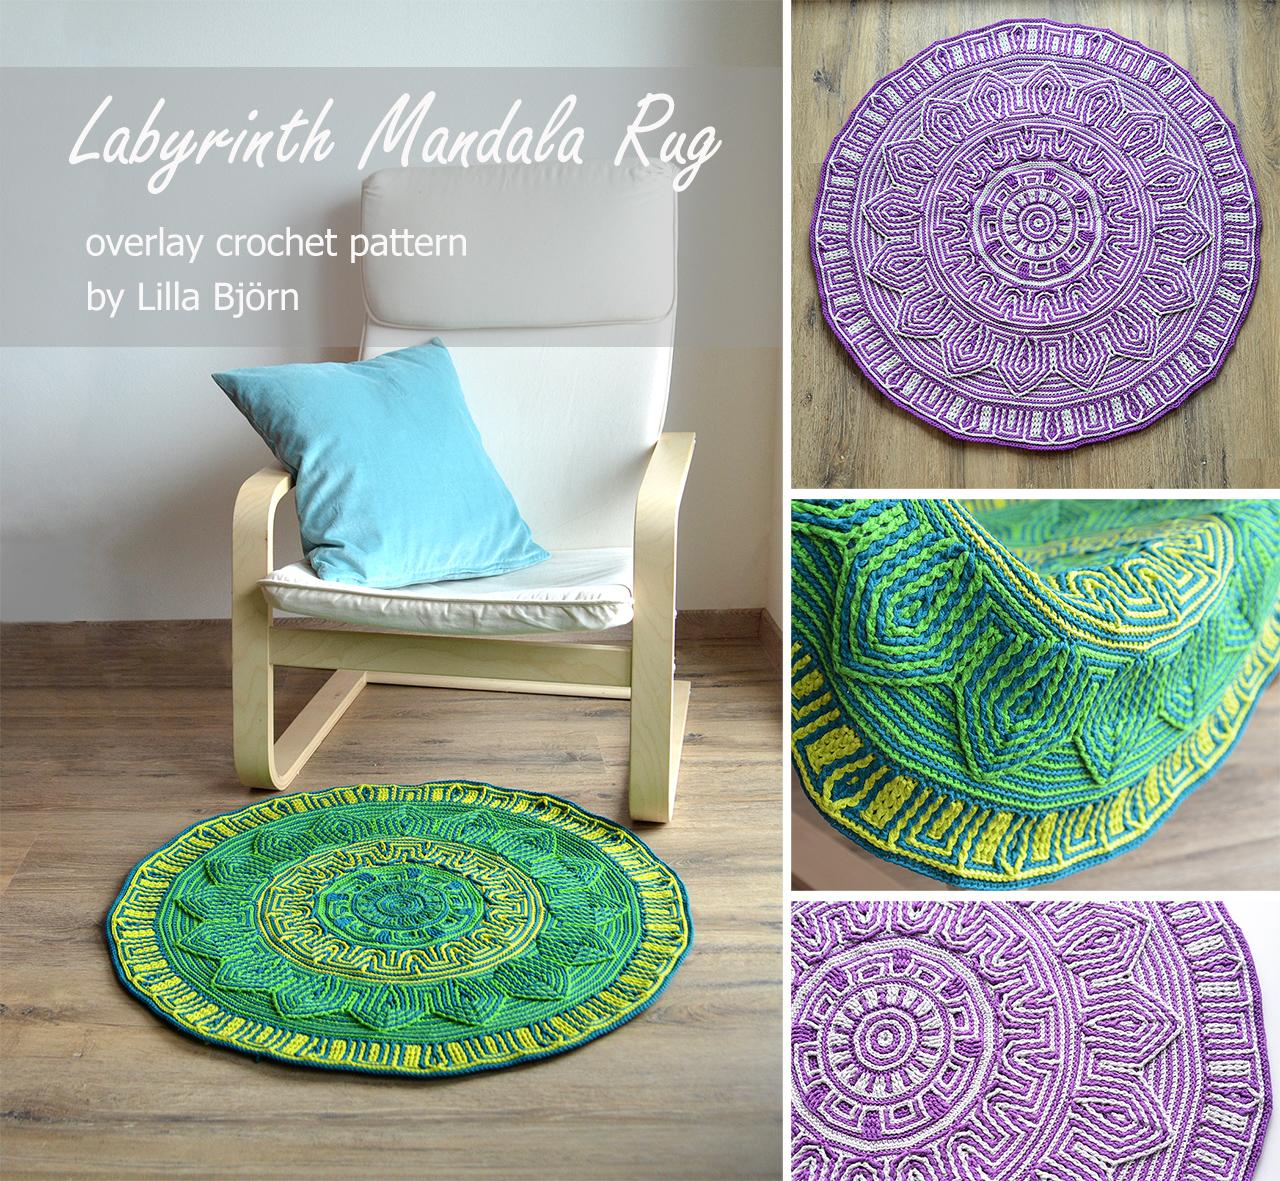 Labyrinth Mandala Rug - original overlay crochet pattern by Lilla Bjorn